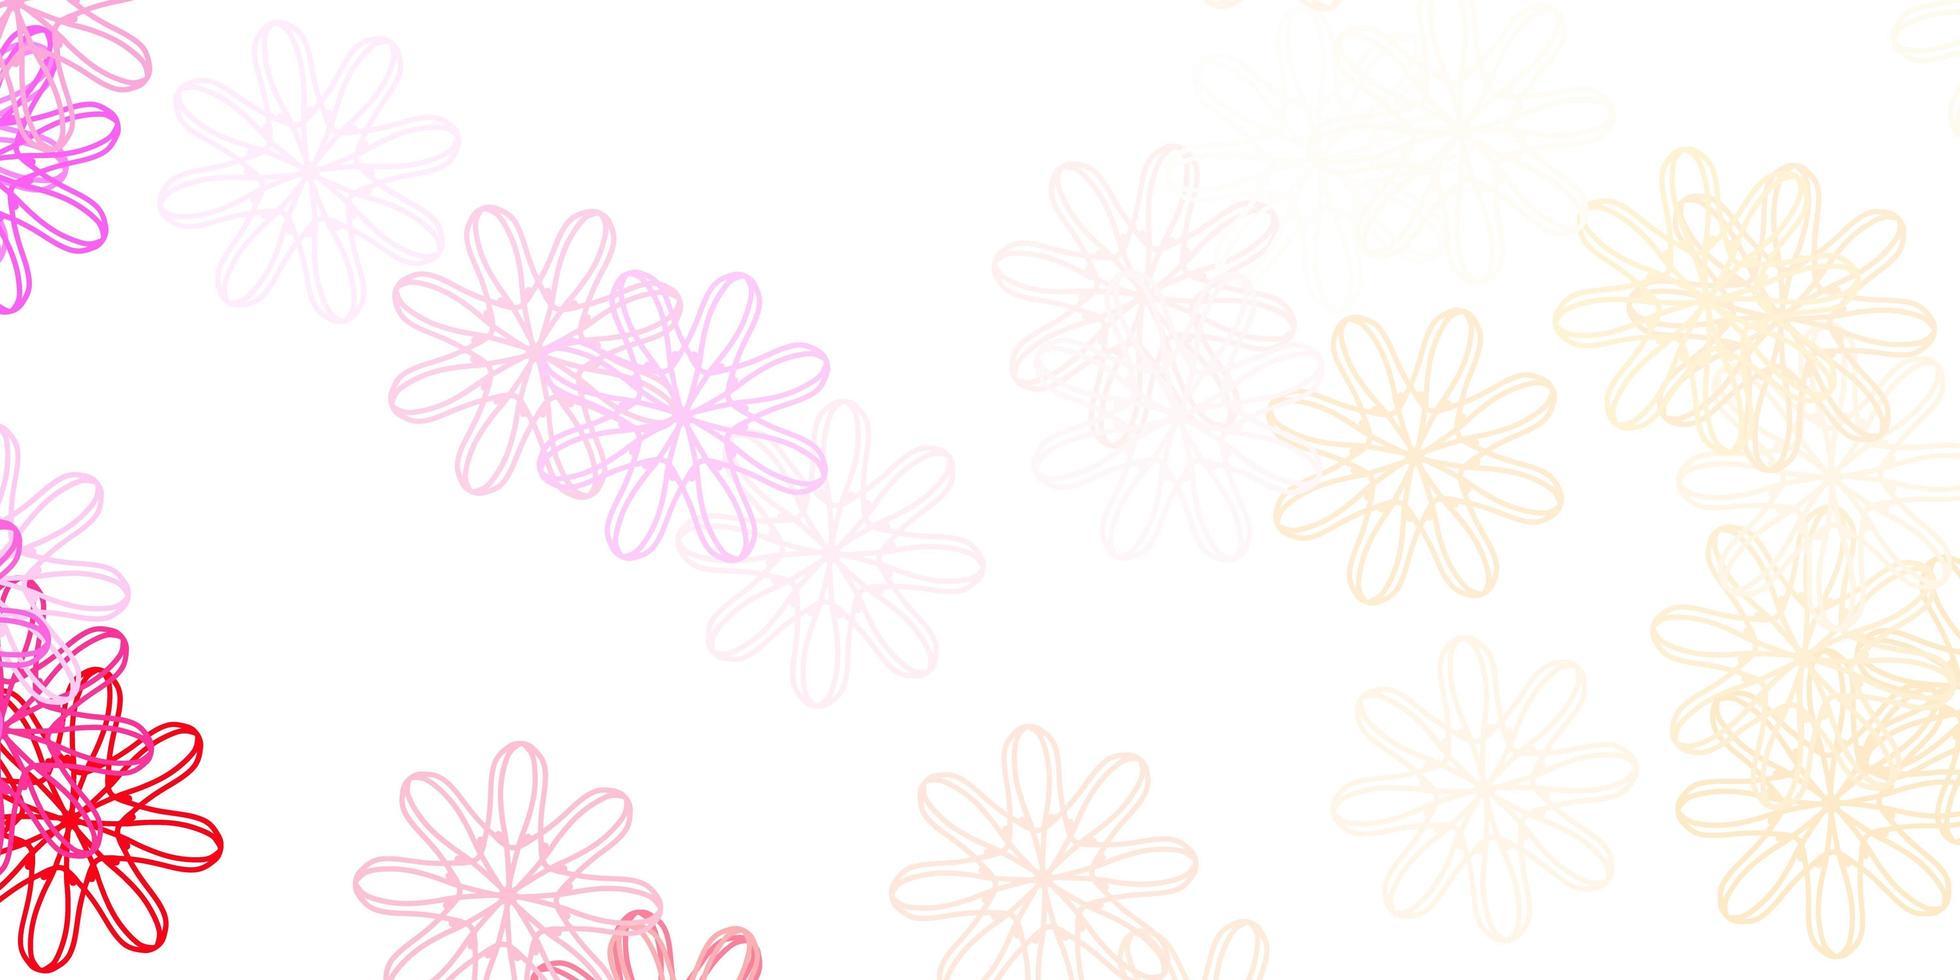 textura de doodle de vetor rosa claro com flores.